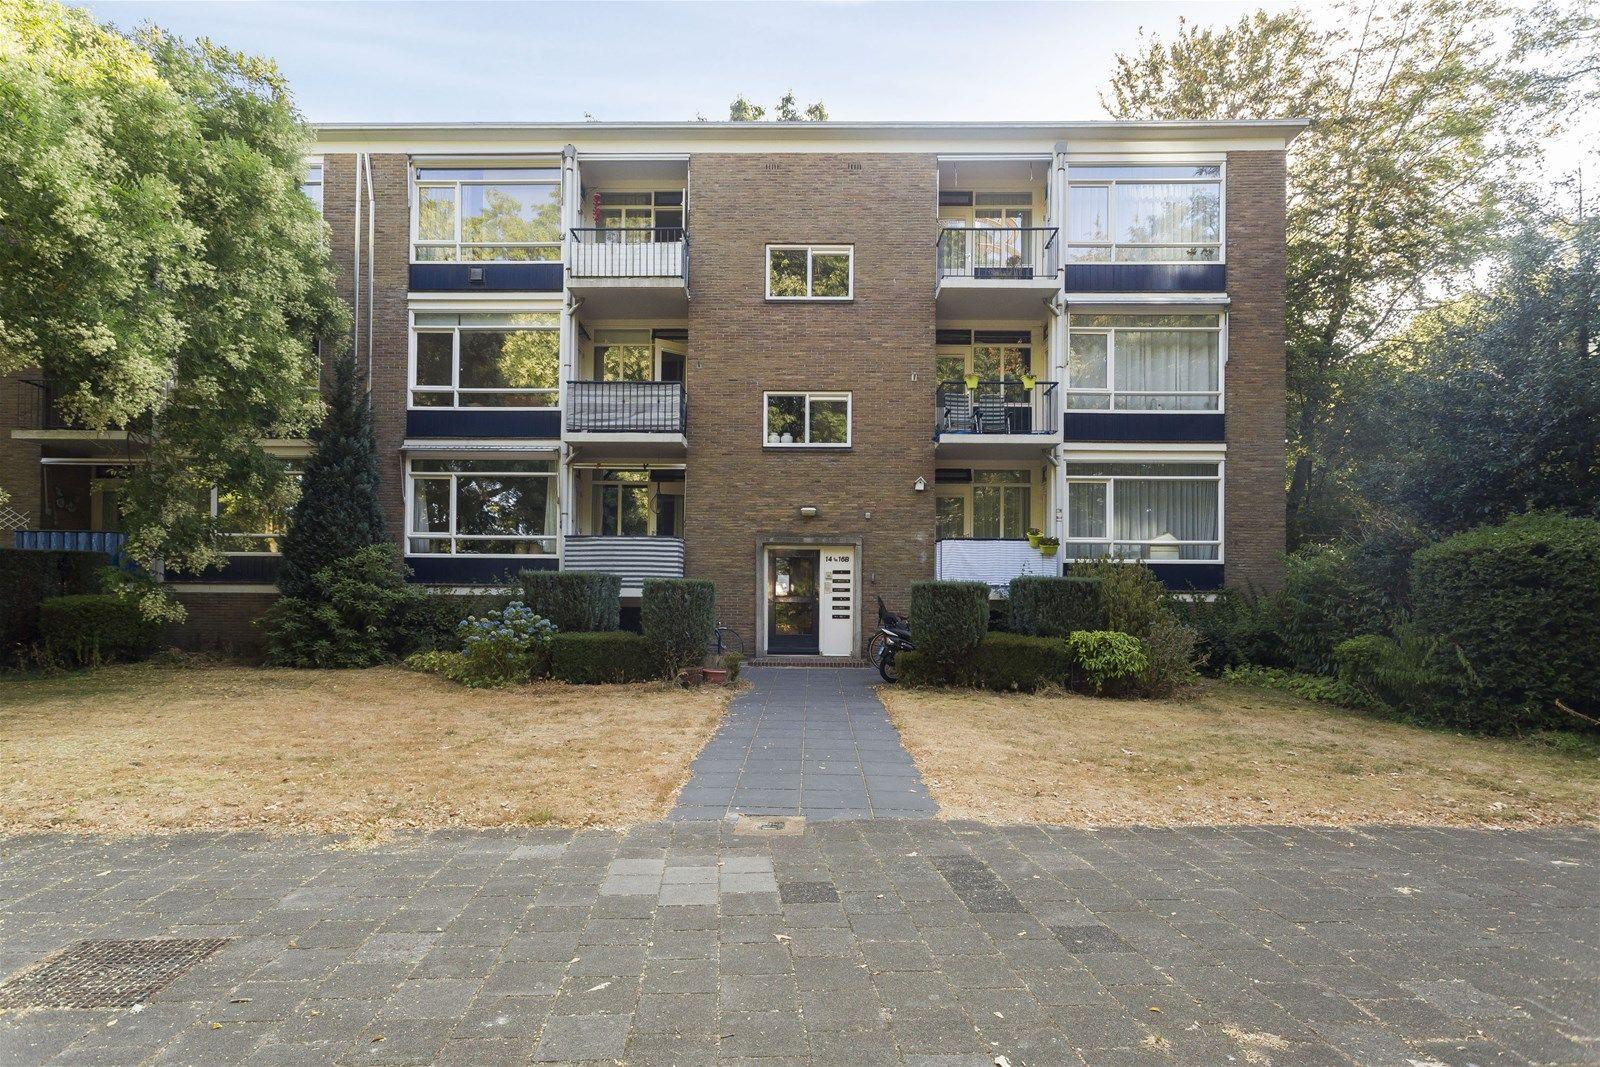 Waltersingel 16a, Apeldoorn